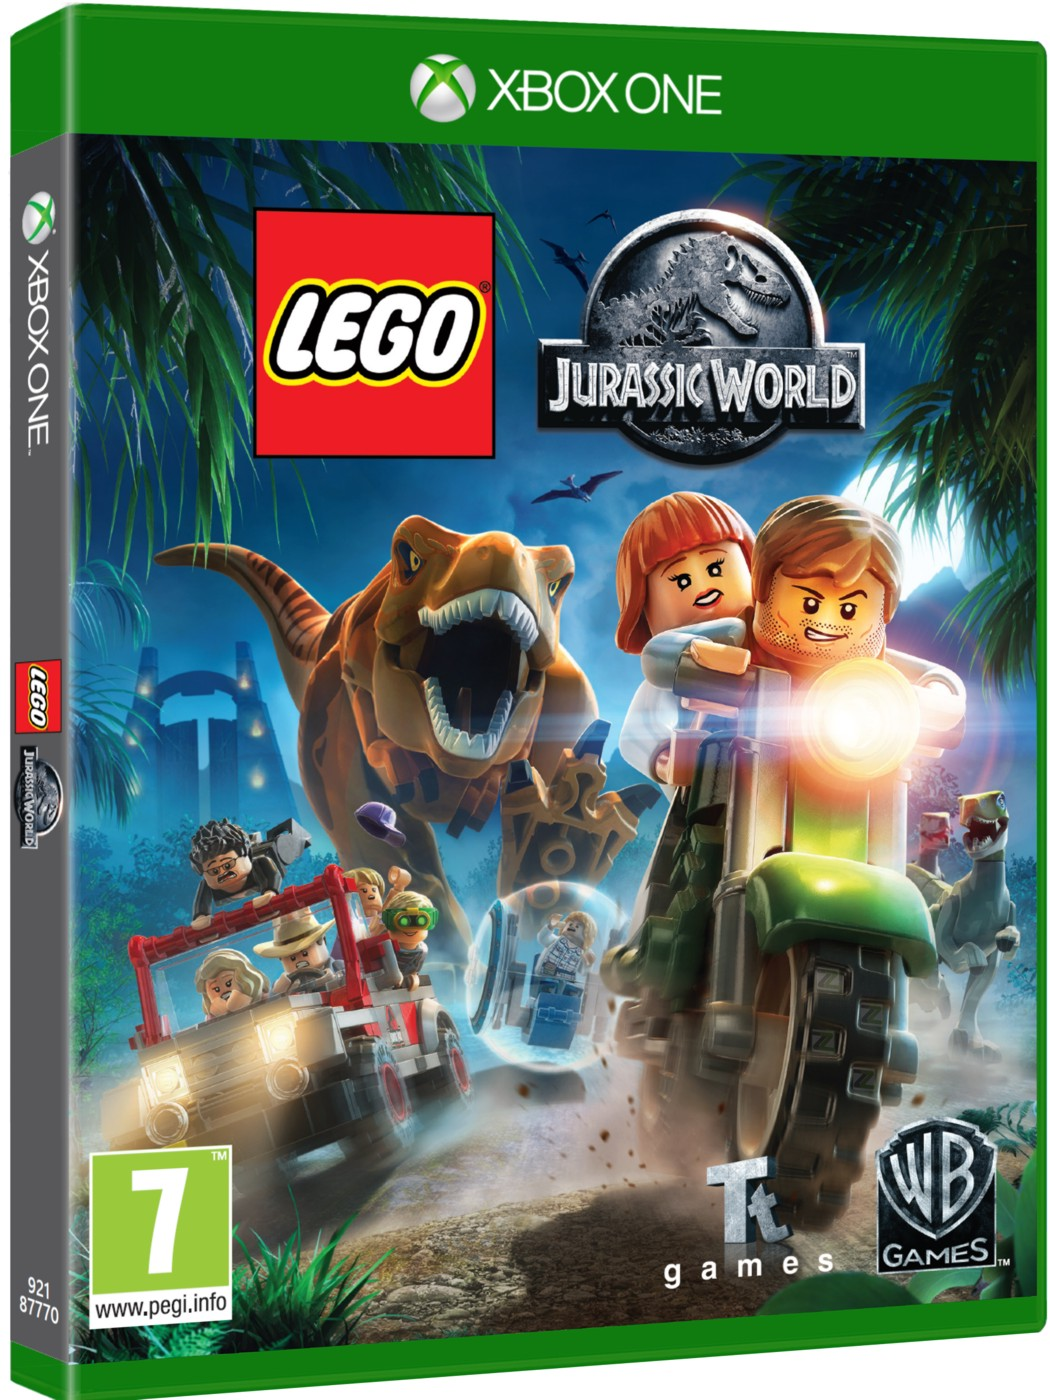 LEGO Jurassic World Game - Xbox One